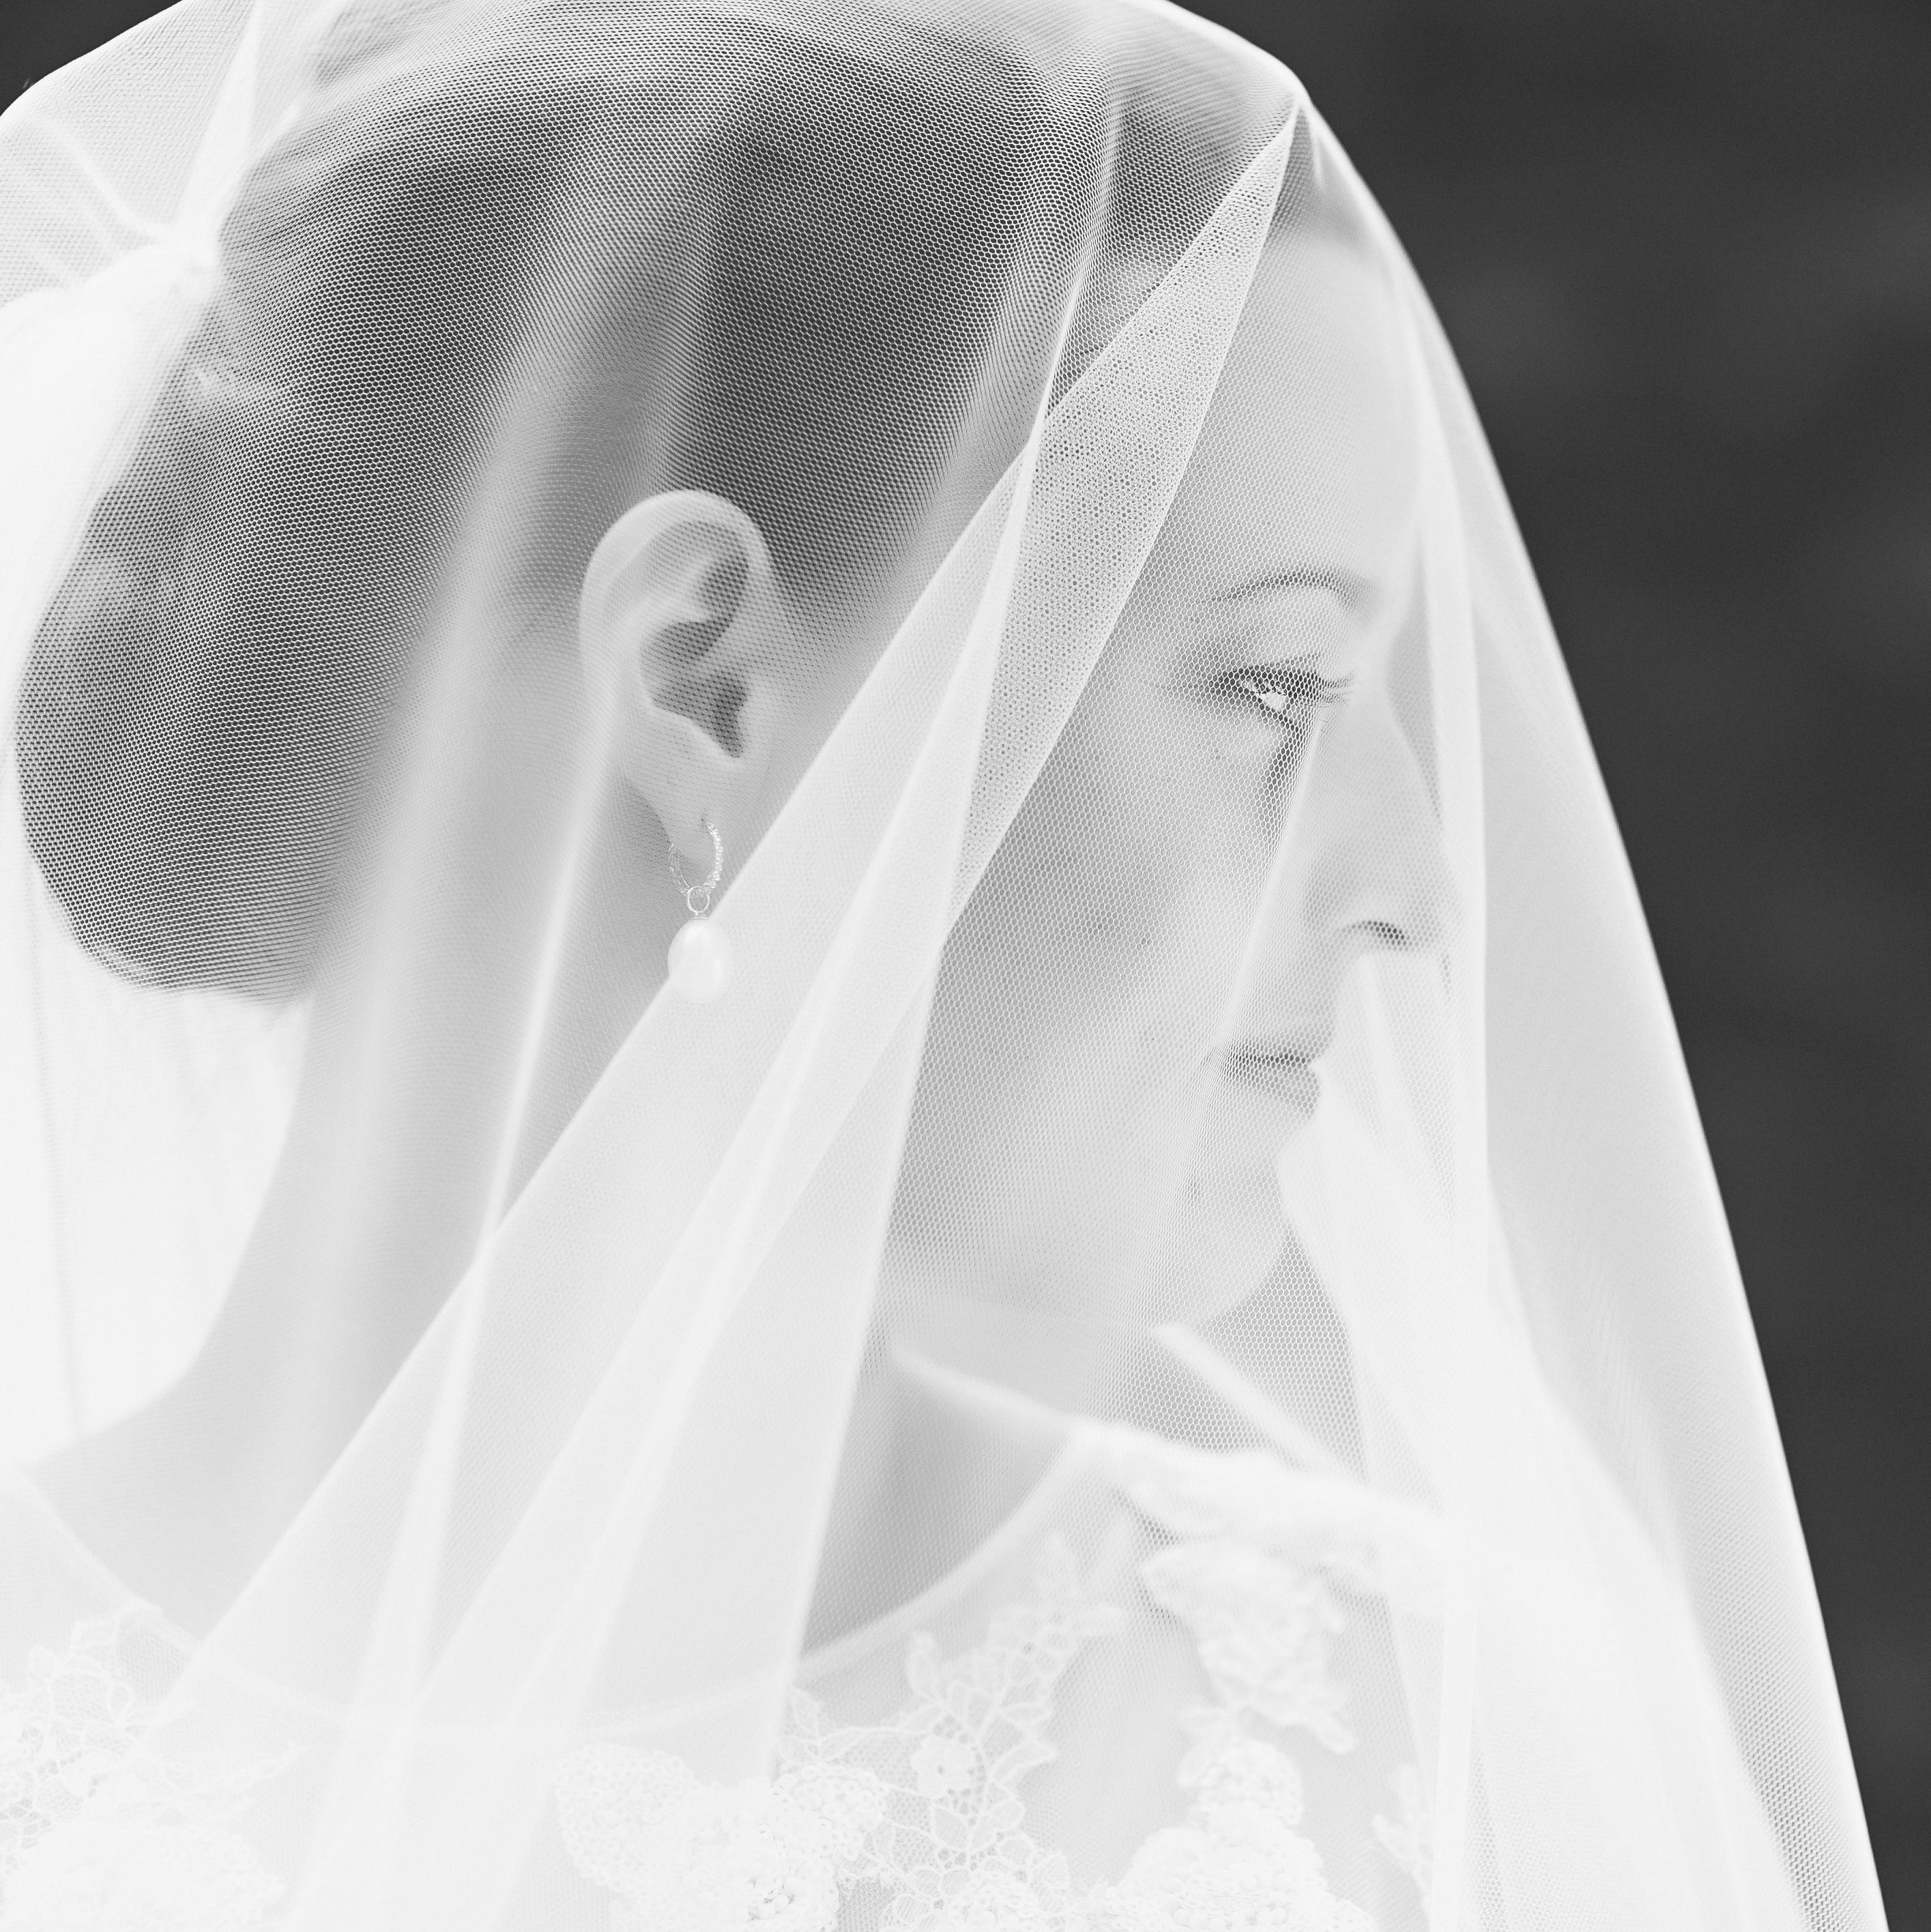 Bruidsvisagist van Limburg